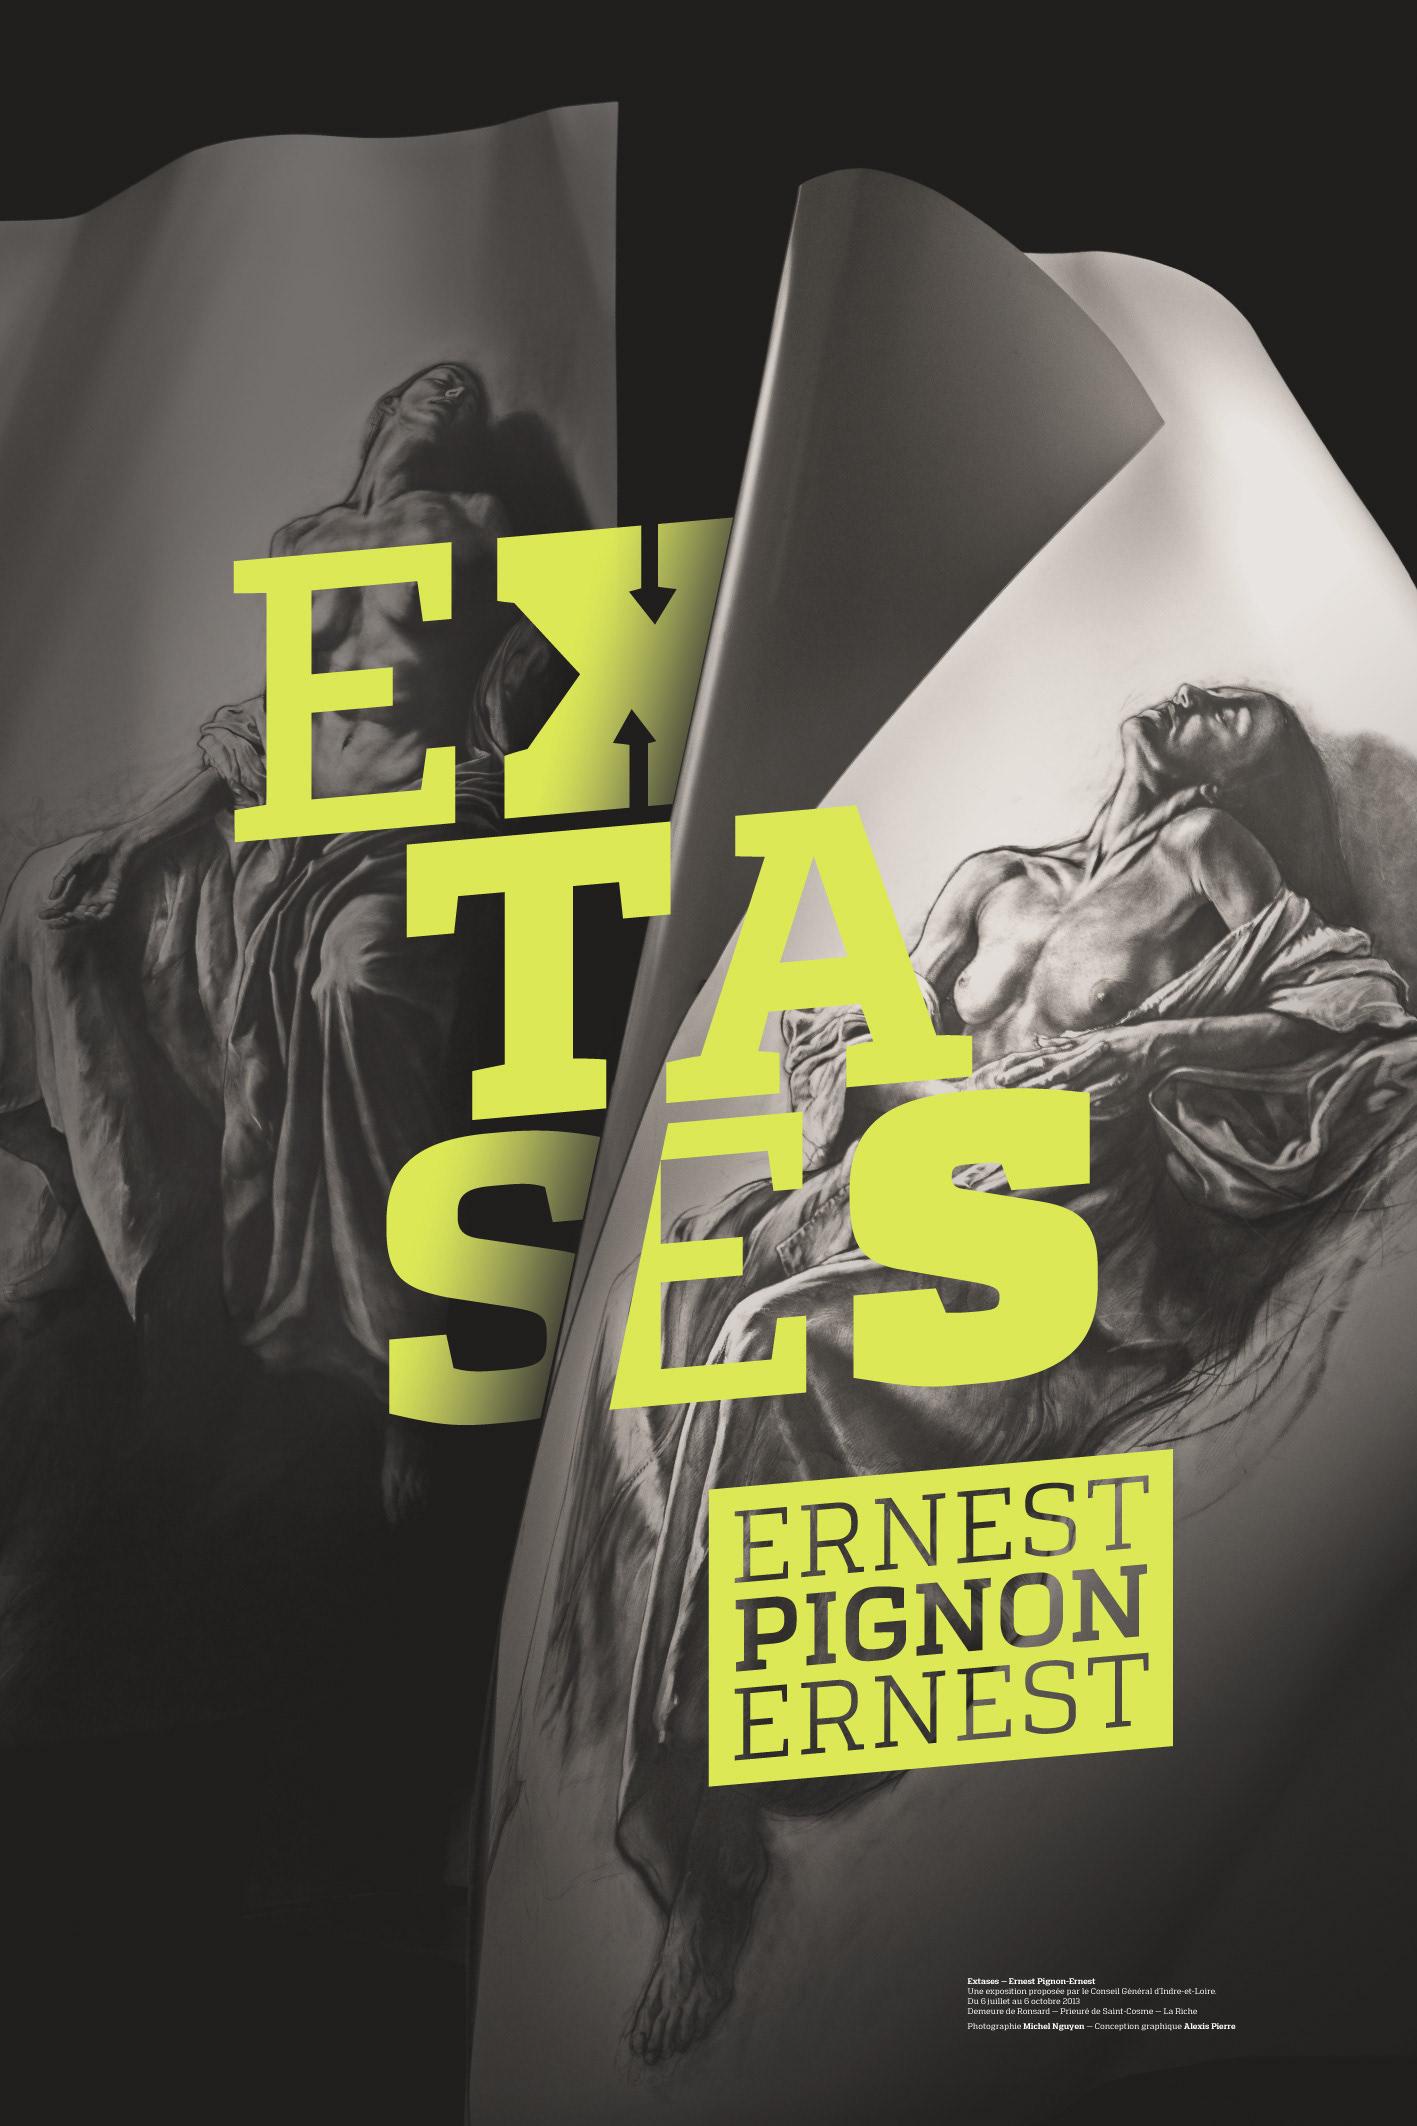 Extases Ernest Pignon-Ernest